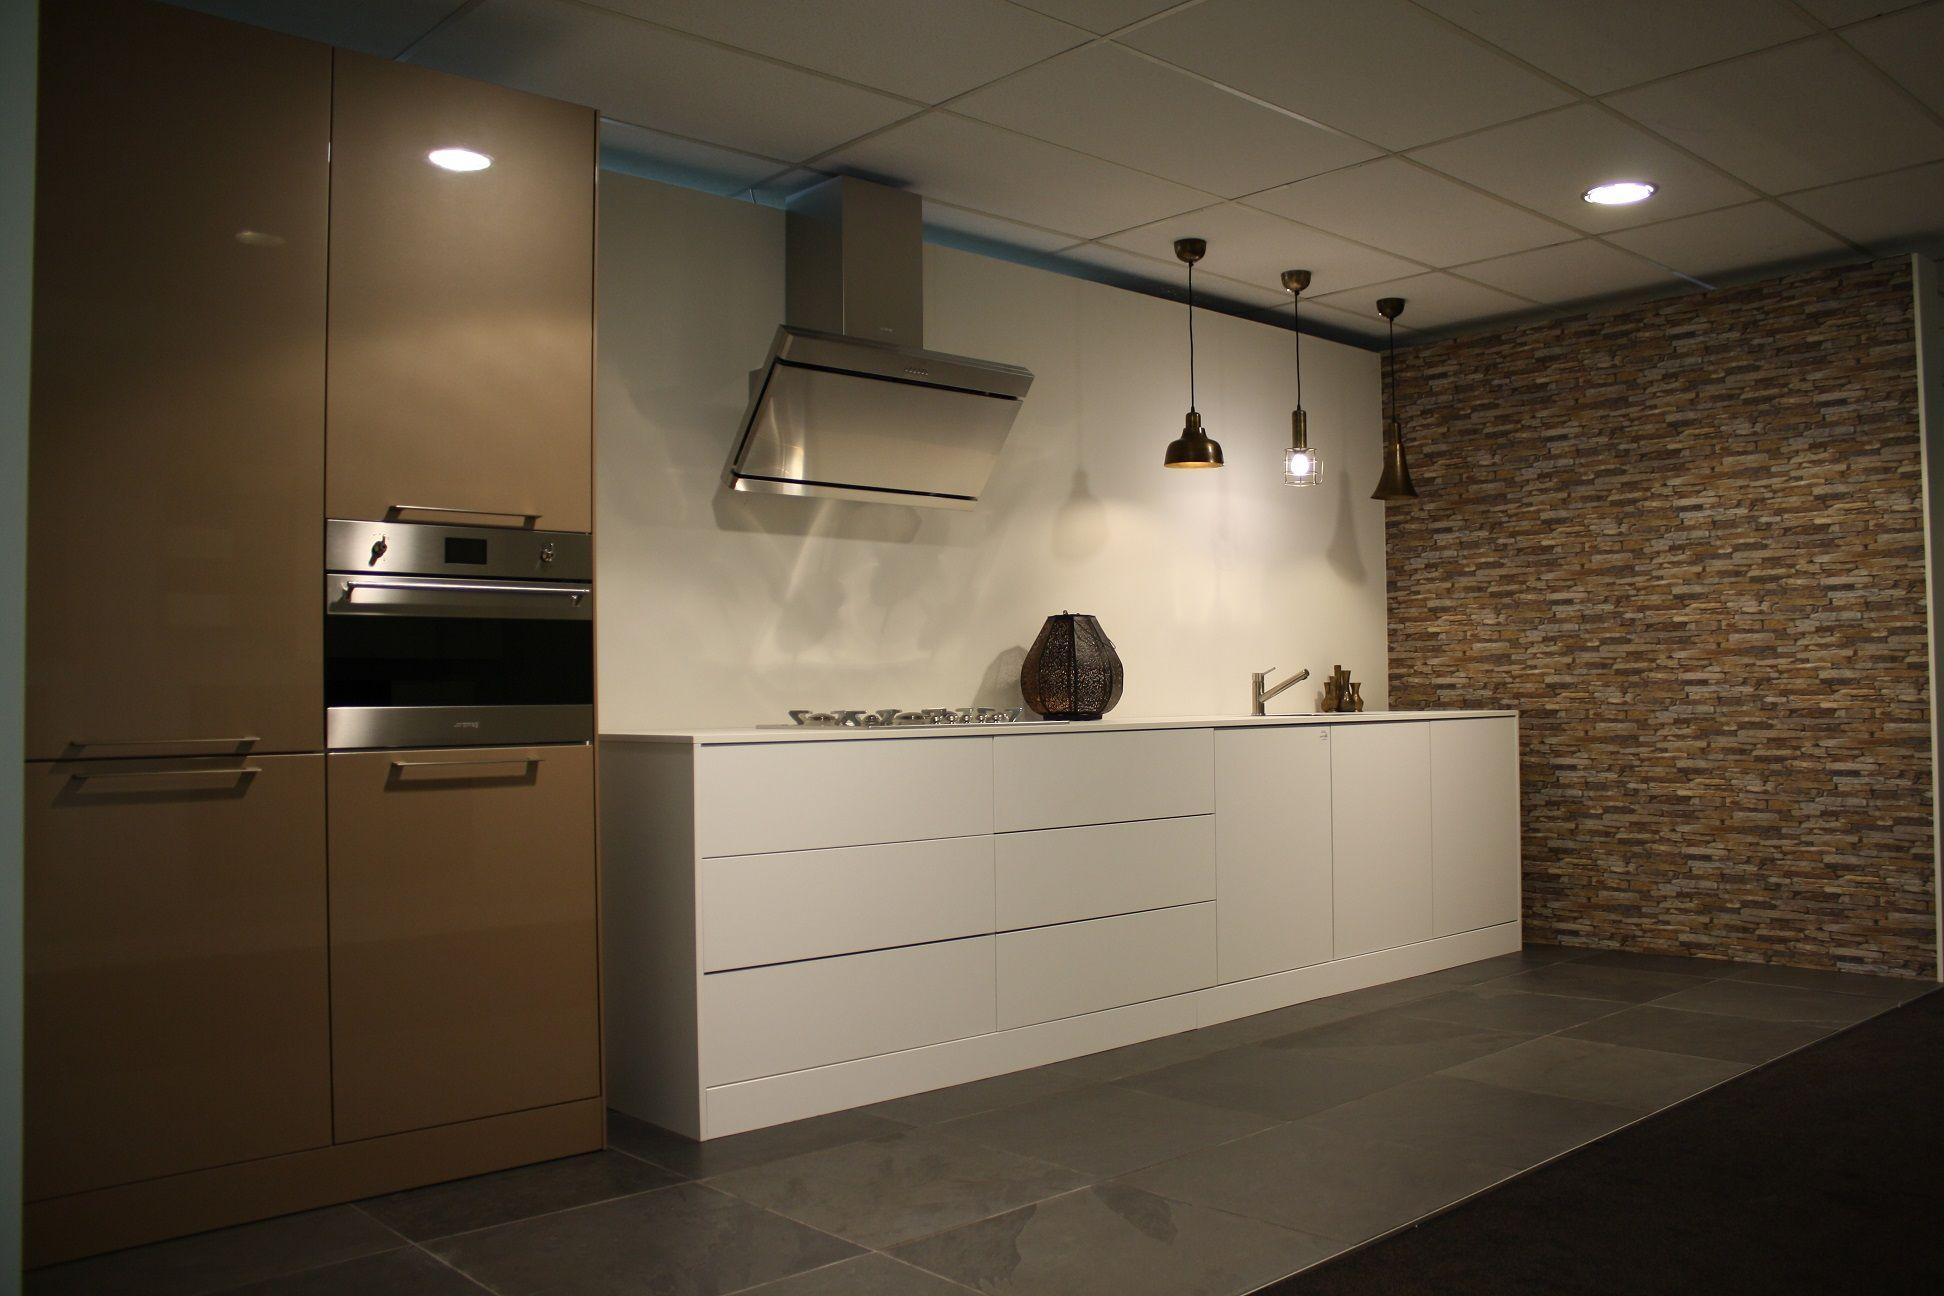 Deco witte keuken maison design navsop